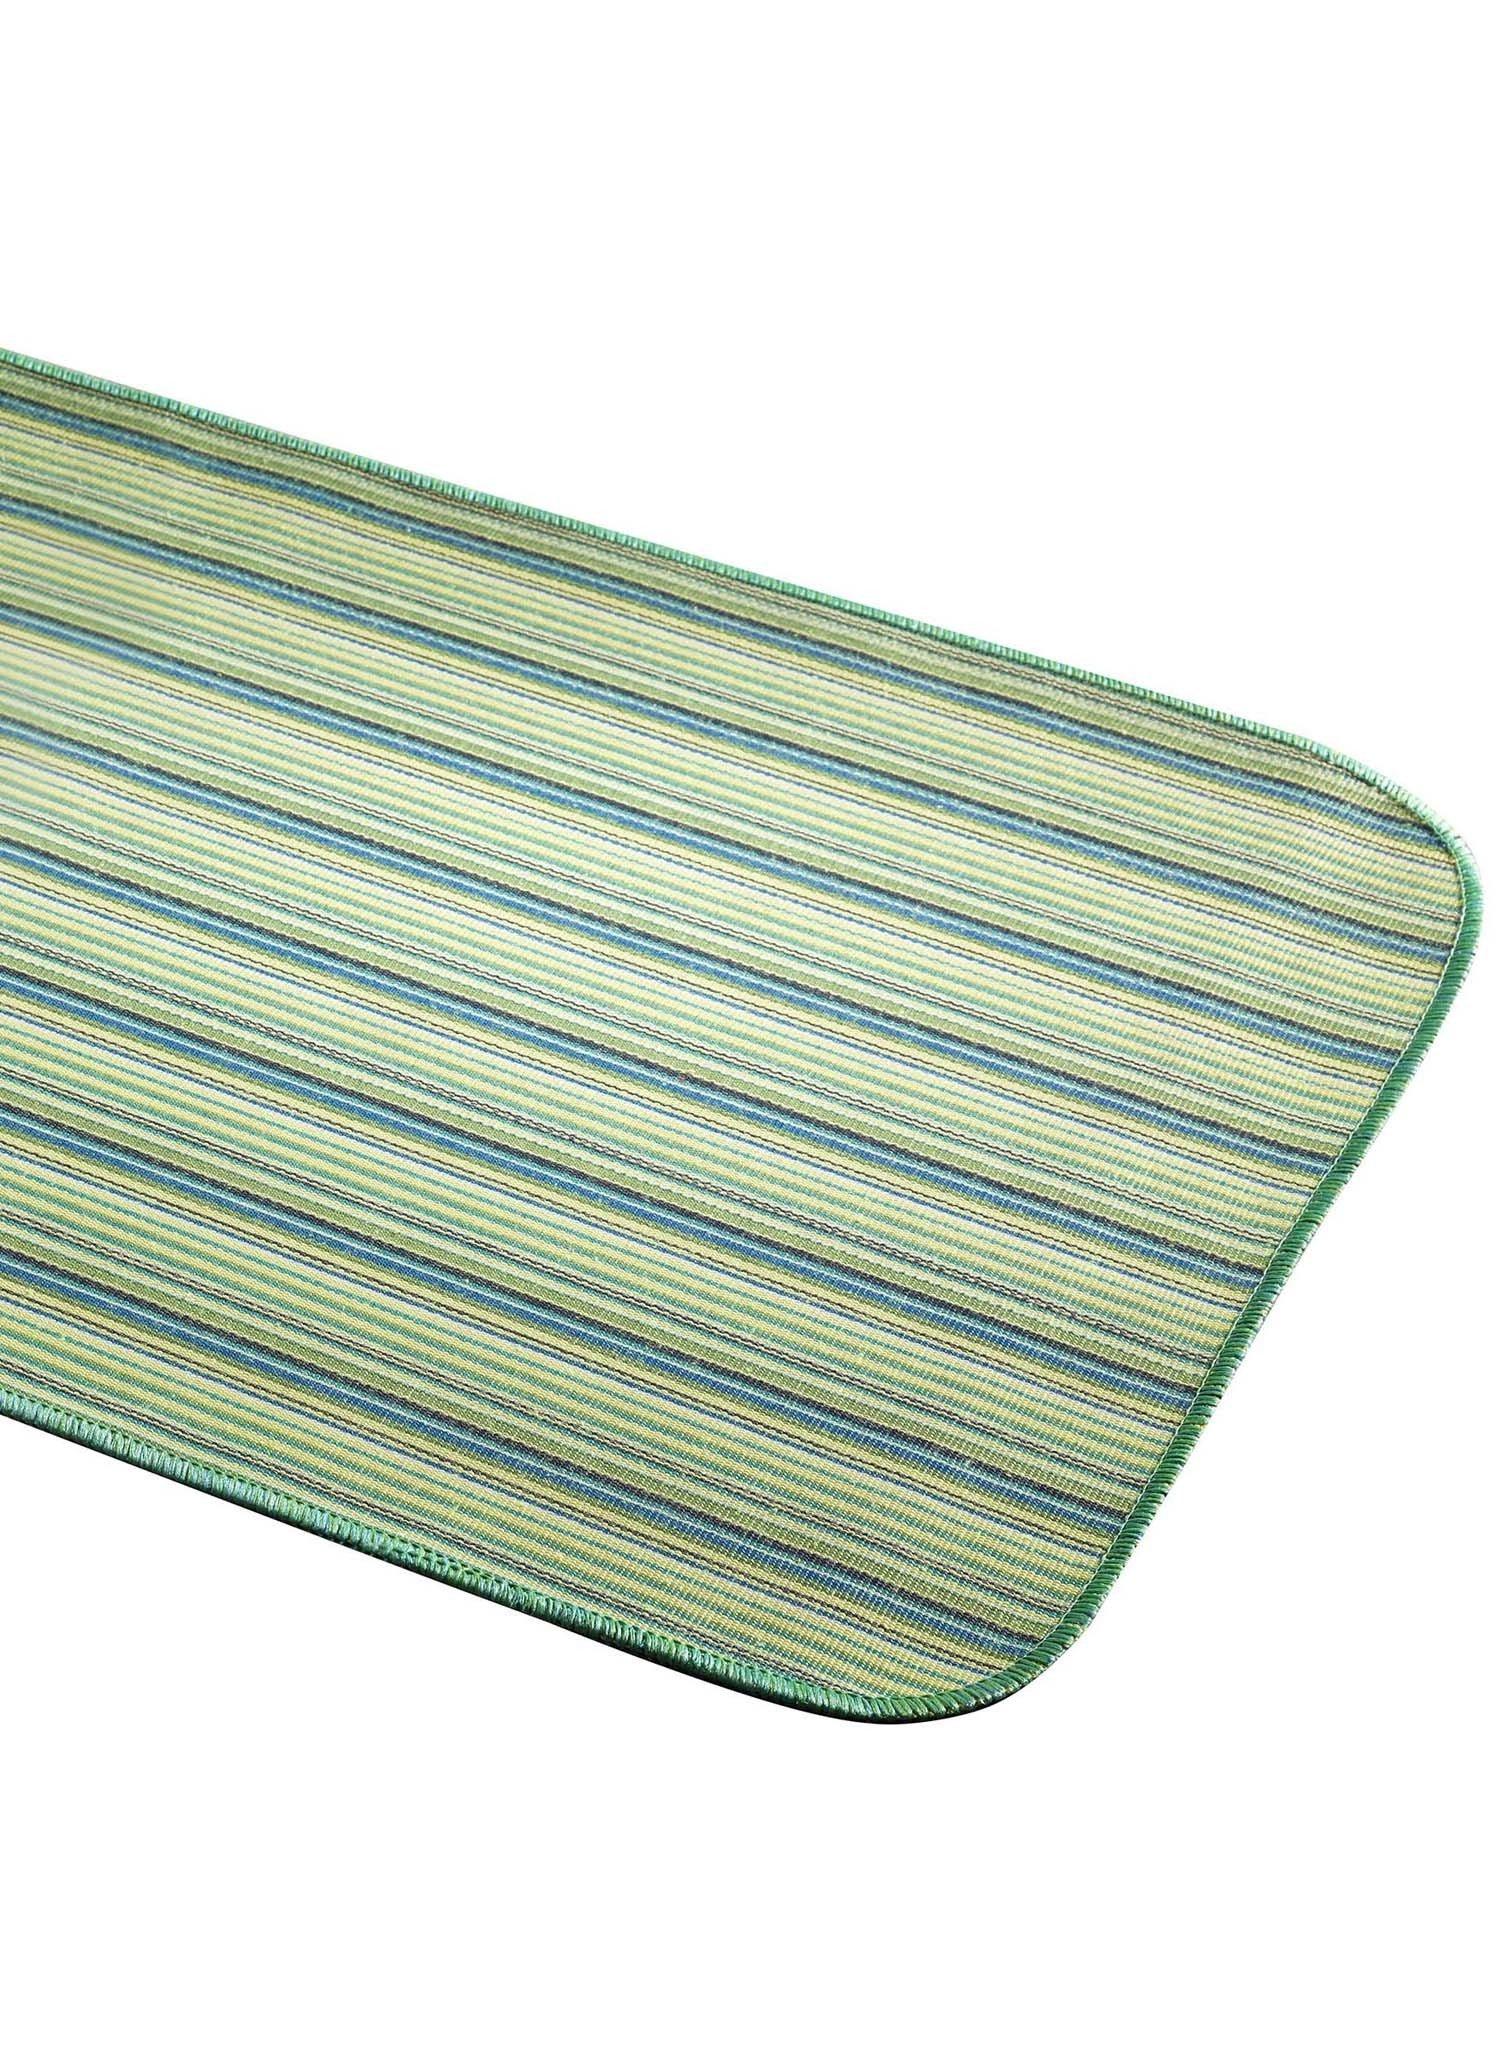 Küchen/Al.Teppich 57x115 grün - 1 - Ronja.ch